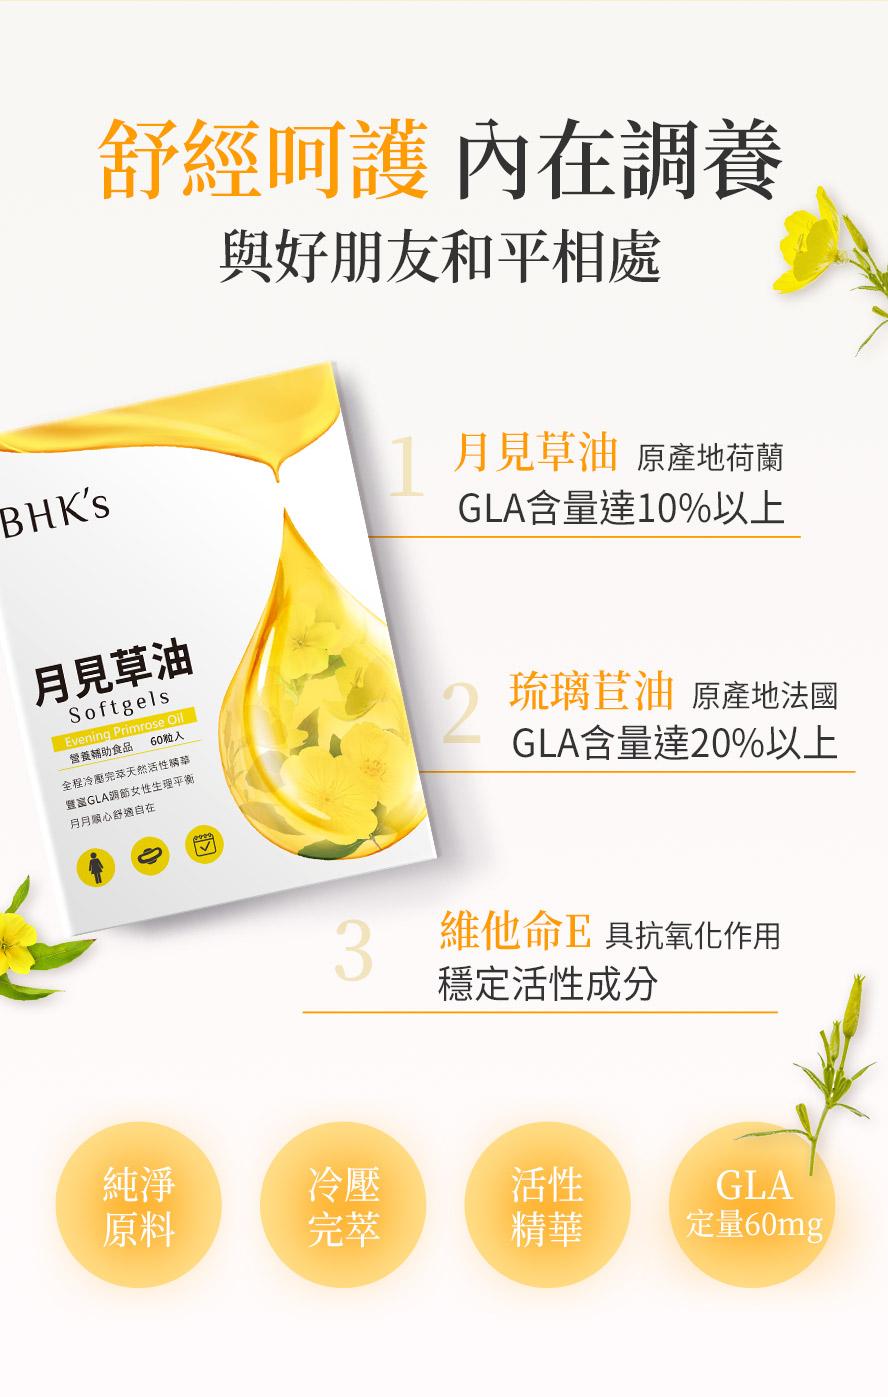 BHK月見草油,嚴選歐洲月見草與琉璃苣,經冷壓萃取保留活性GLA,可改善女性經痛/生理不適問題。